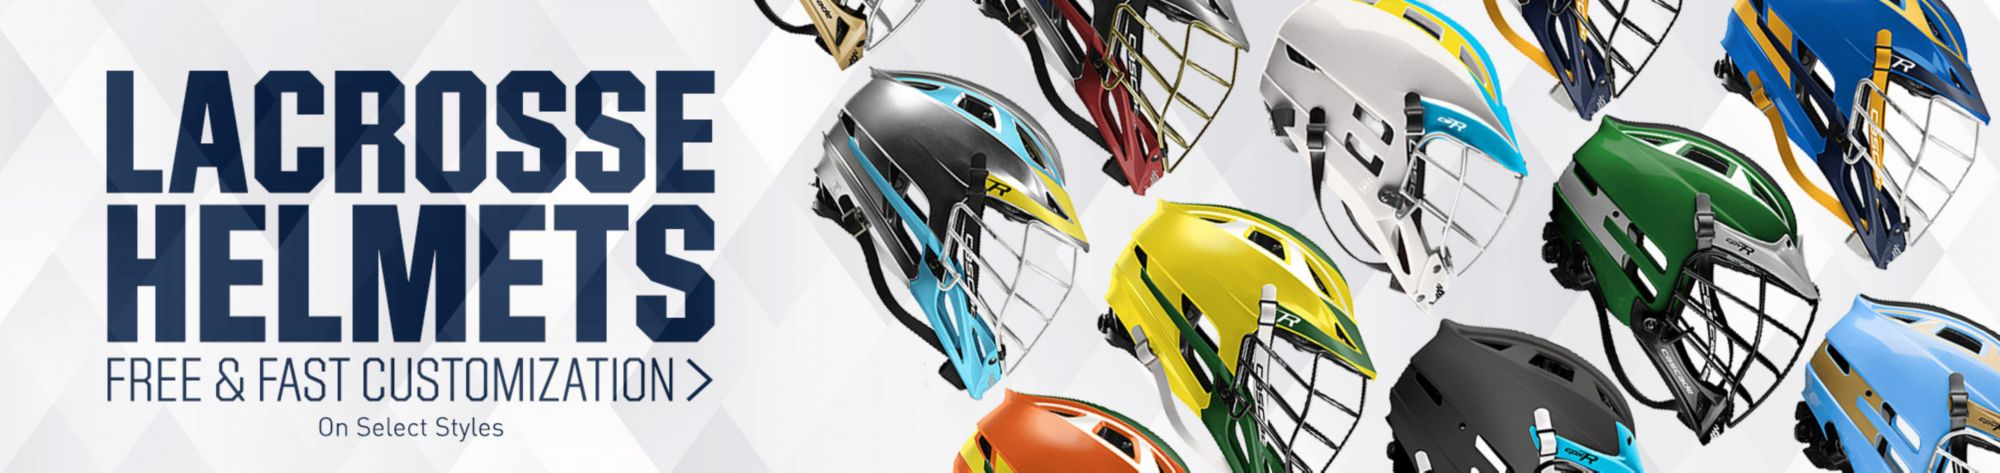 Shop Lacrosse Helmets